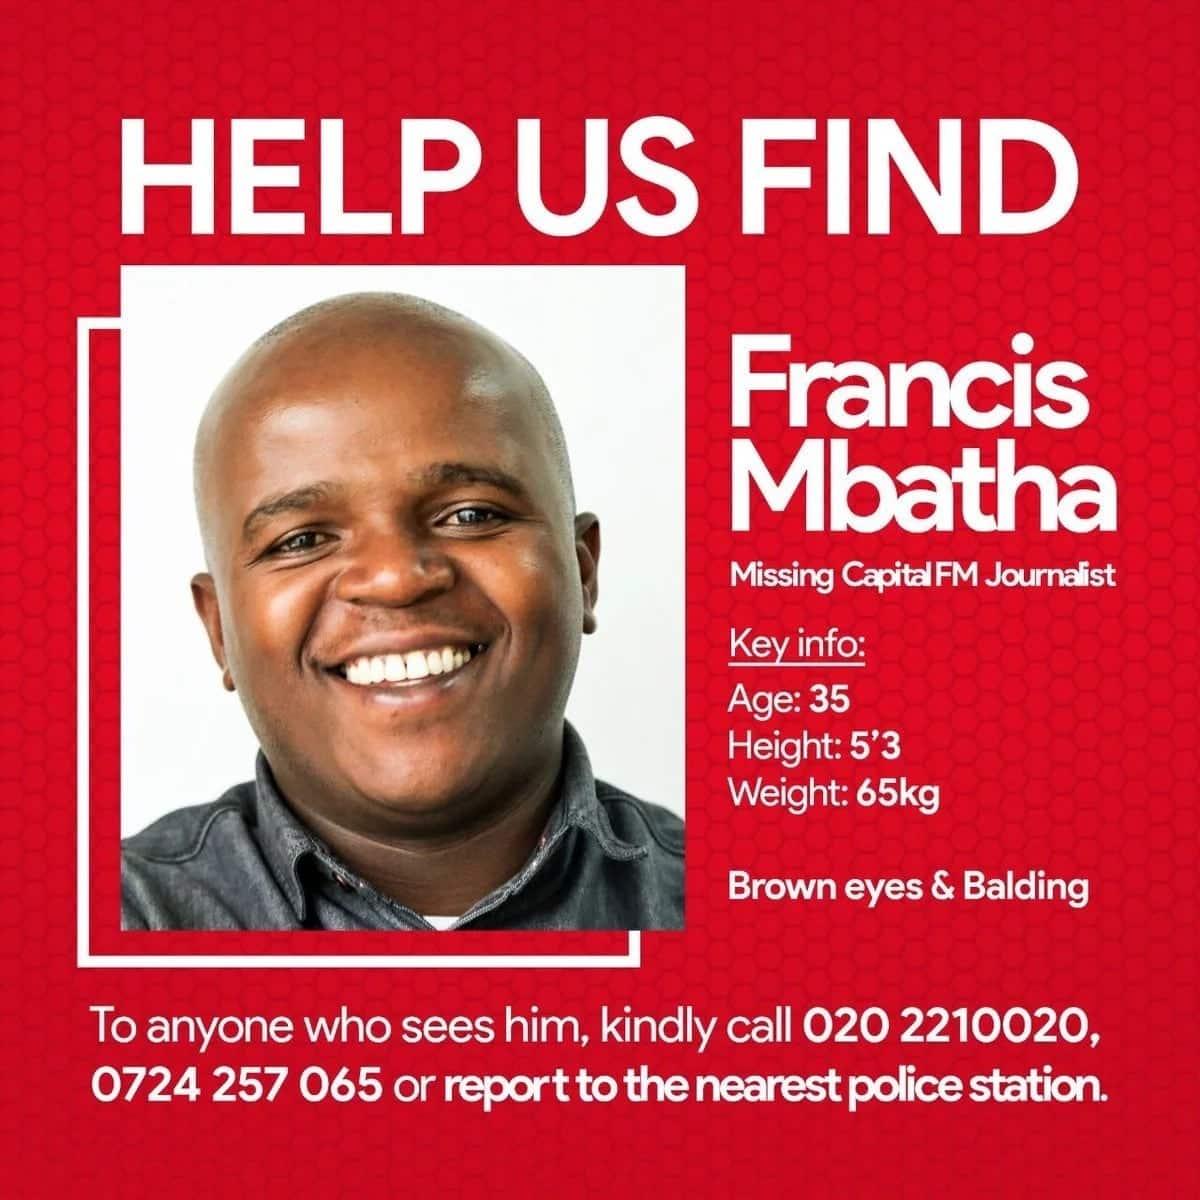 Capital FM journalist goes missing